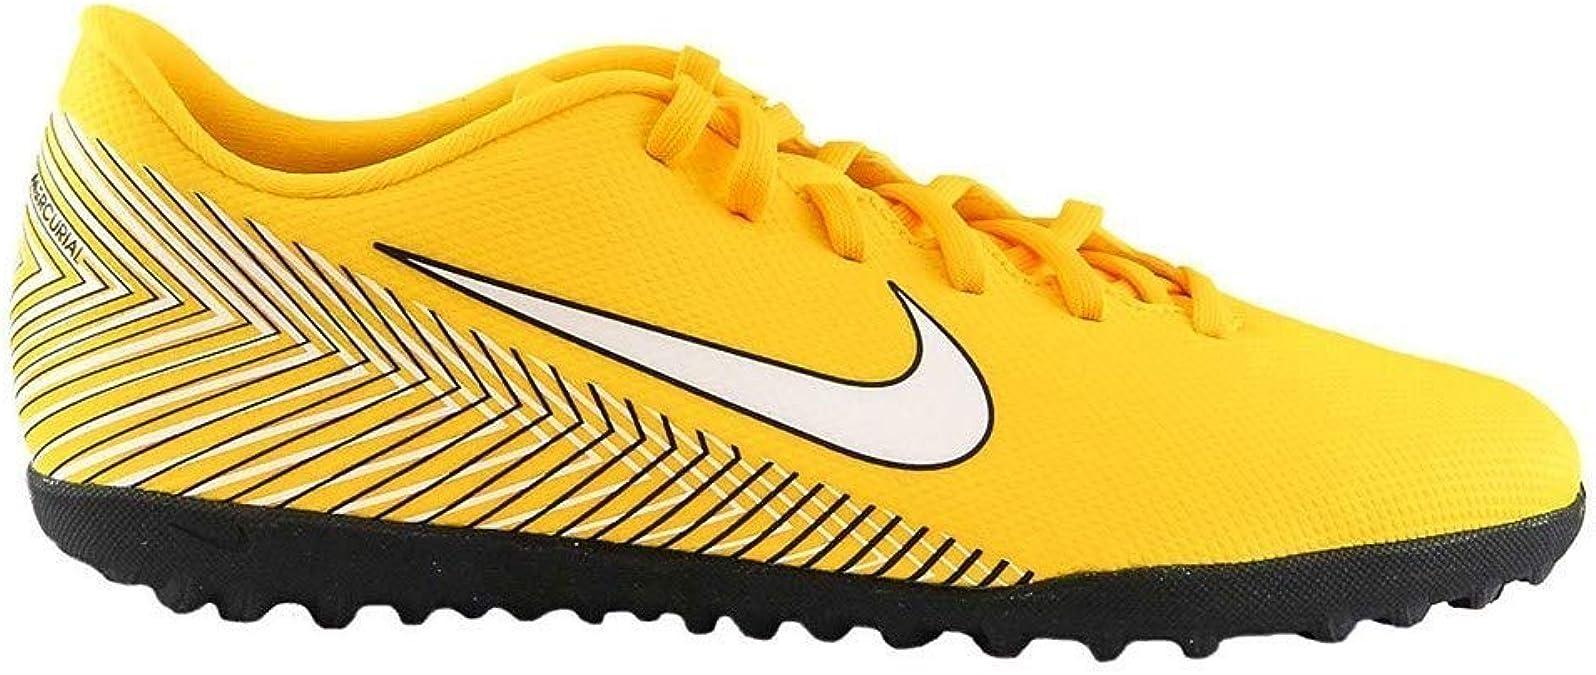 Nike Jr Vapor 12 Club GS NJR TF, Chaussures de Futsal Mixte